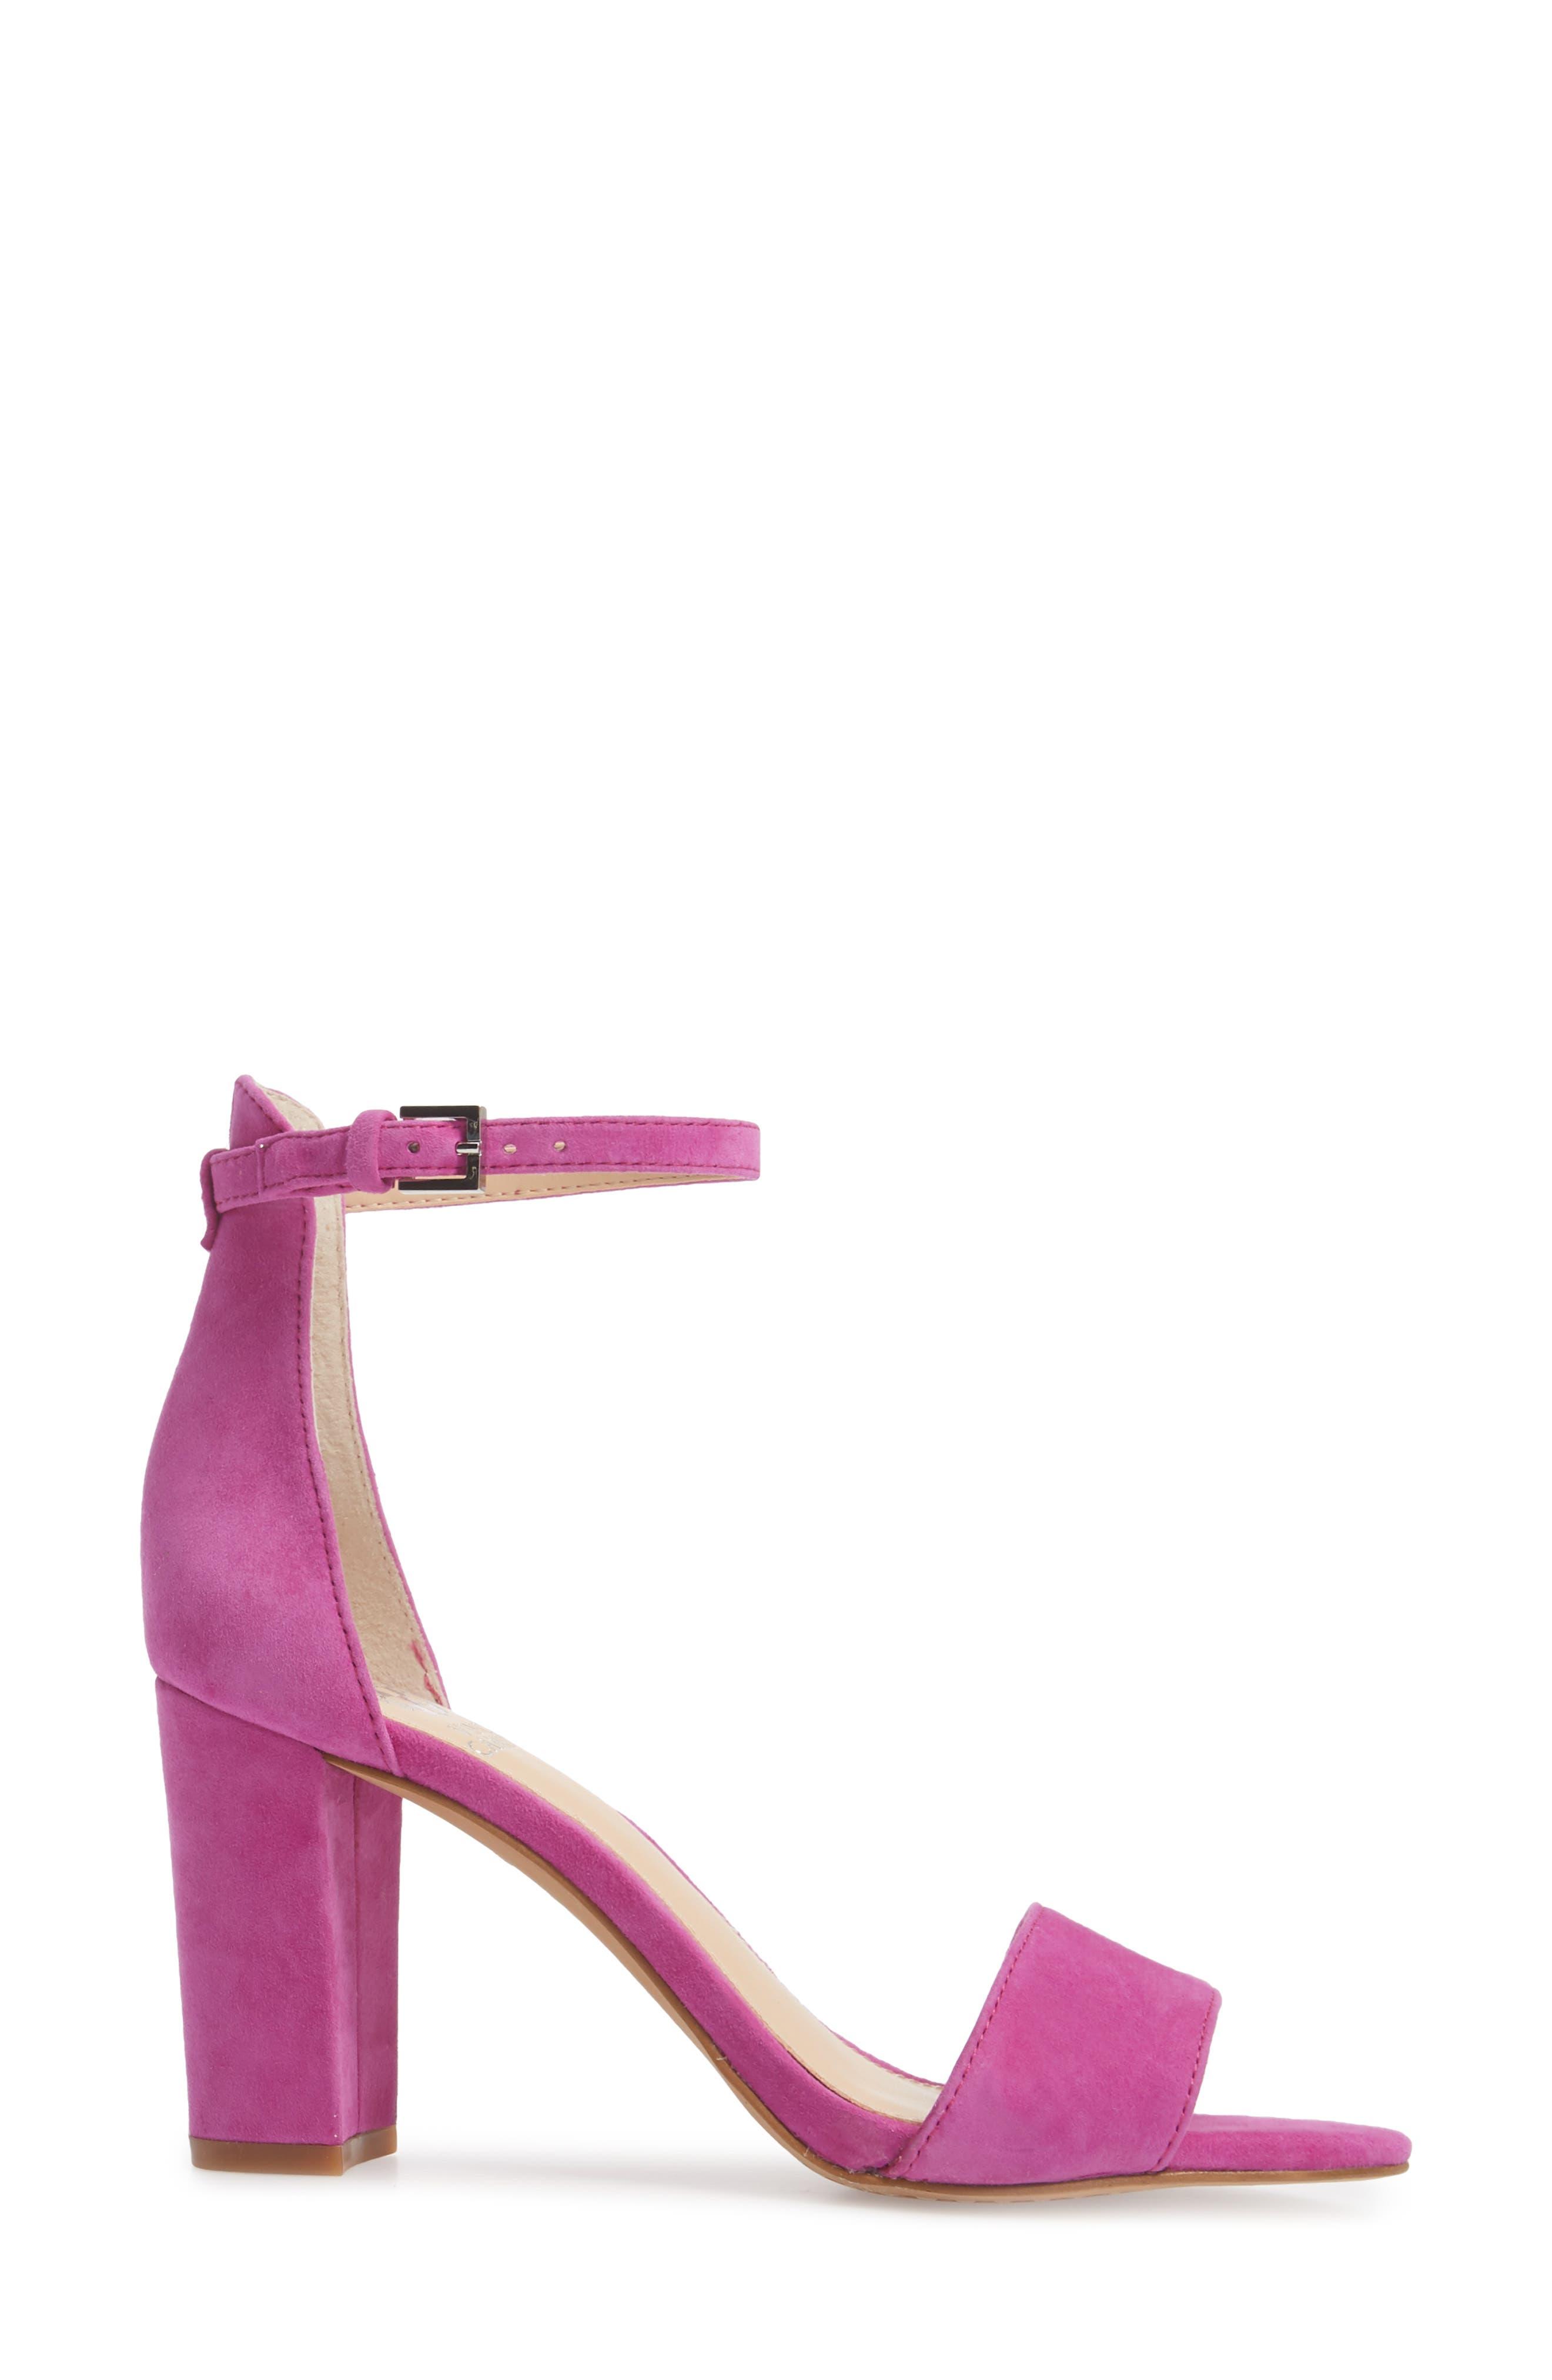 Corlina Ankle Strap Sandal,                             Alternate thumbnail 3, color,                             Drama Pink Suede